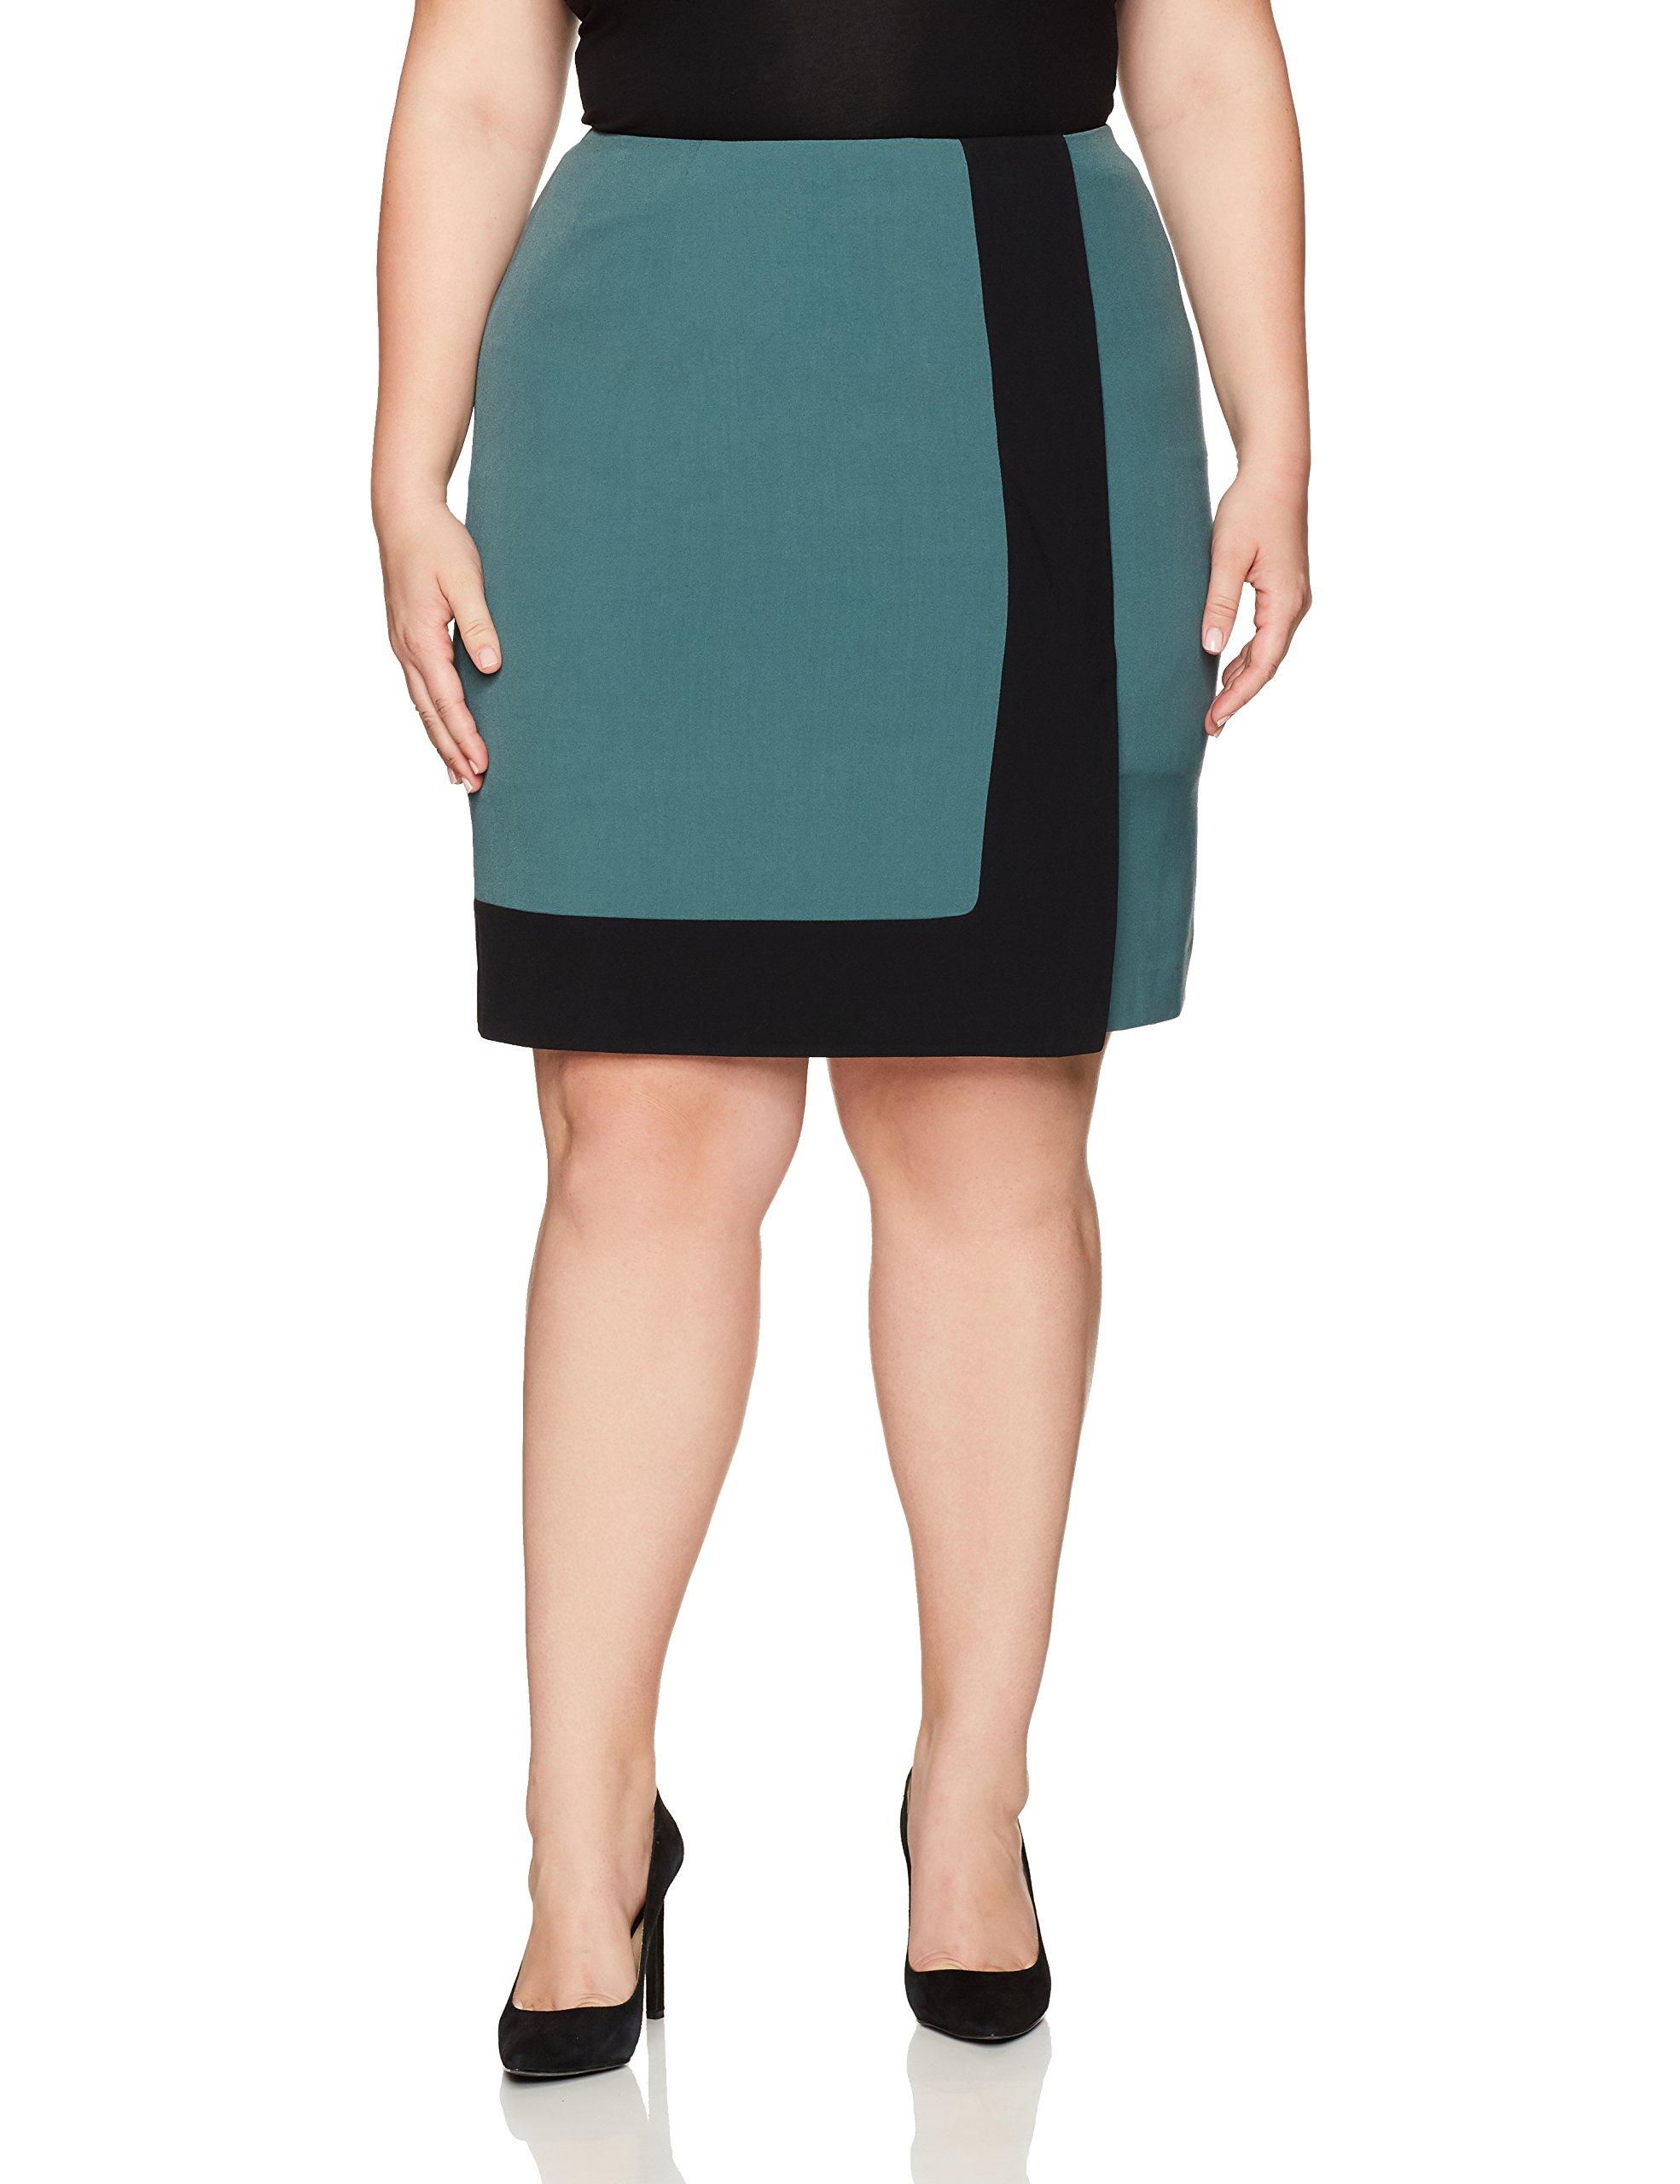 Nine West Women's Plus Size A Line Colorblock Skirt, Patina/Black, 20W by Nine West